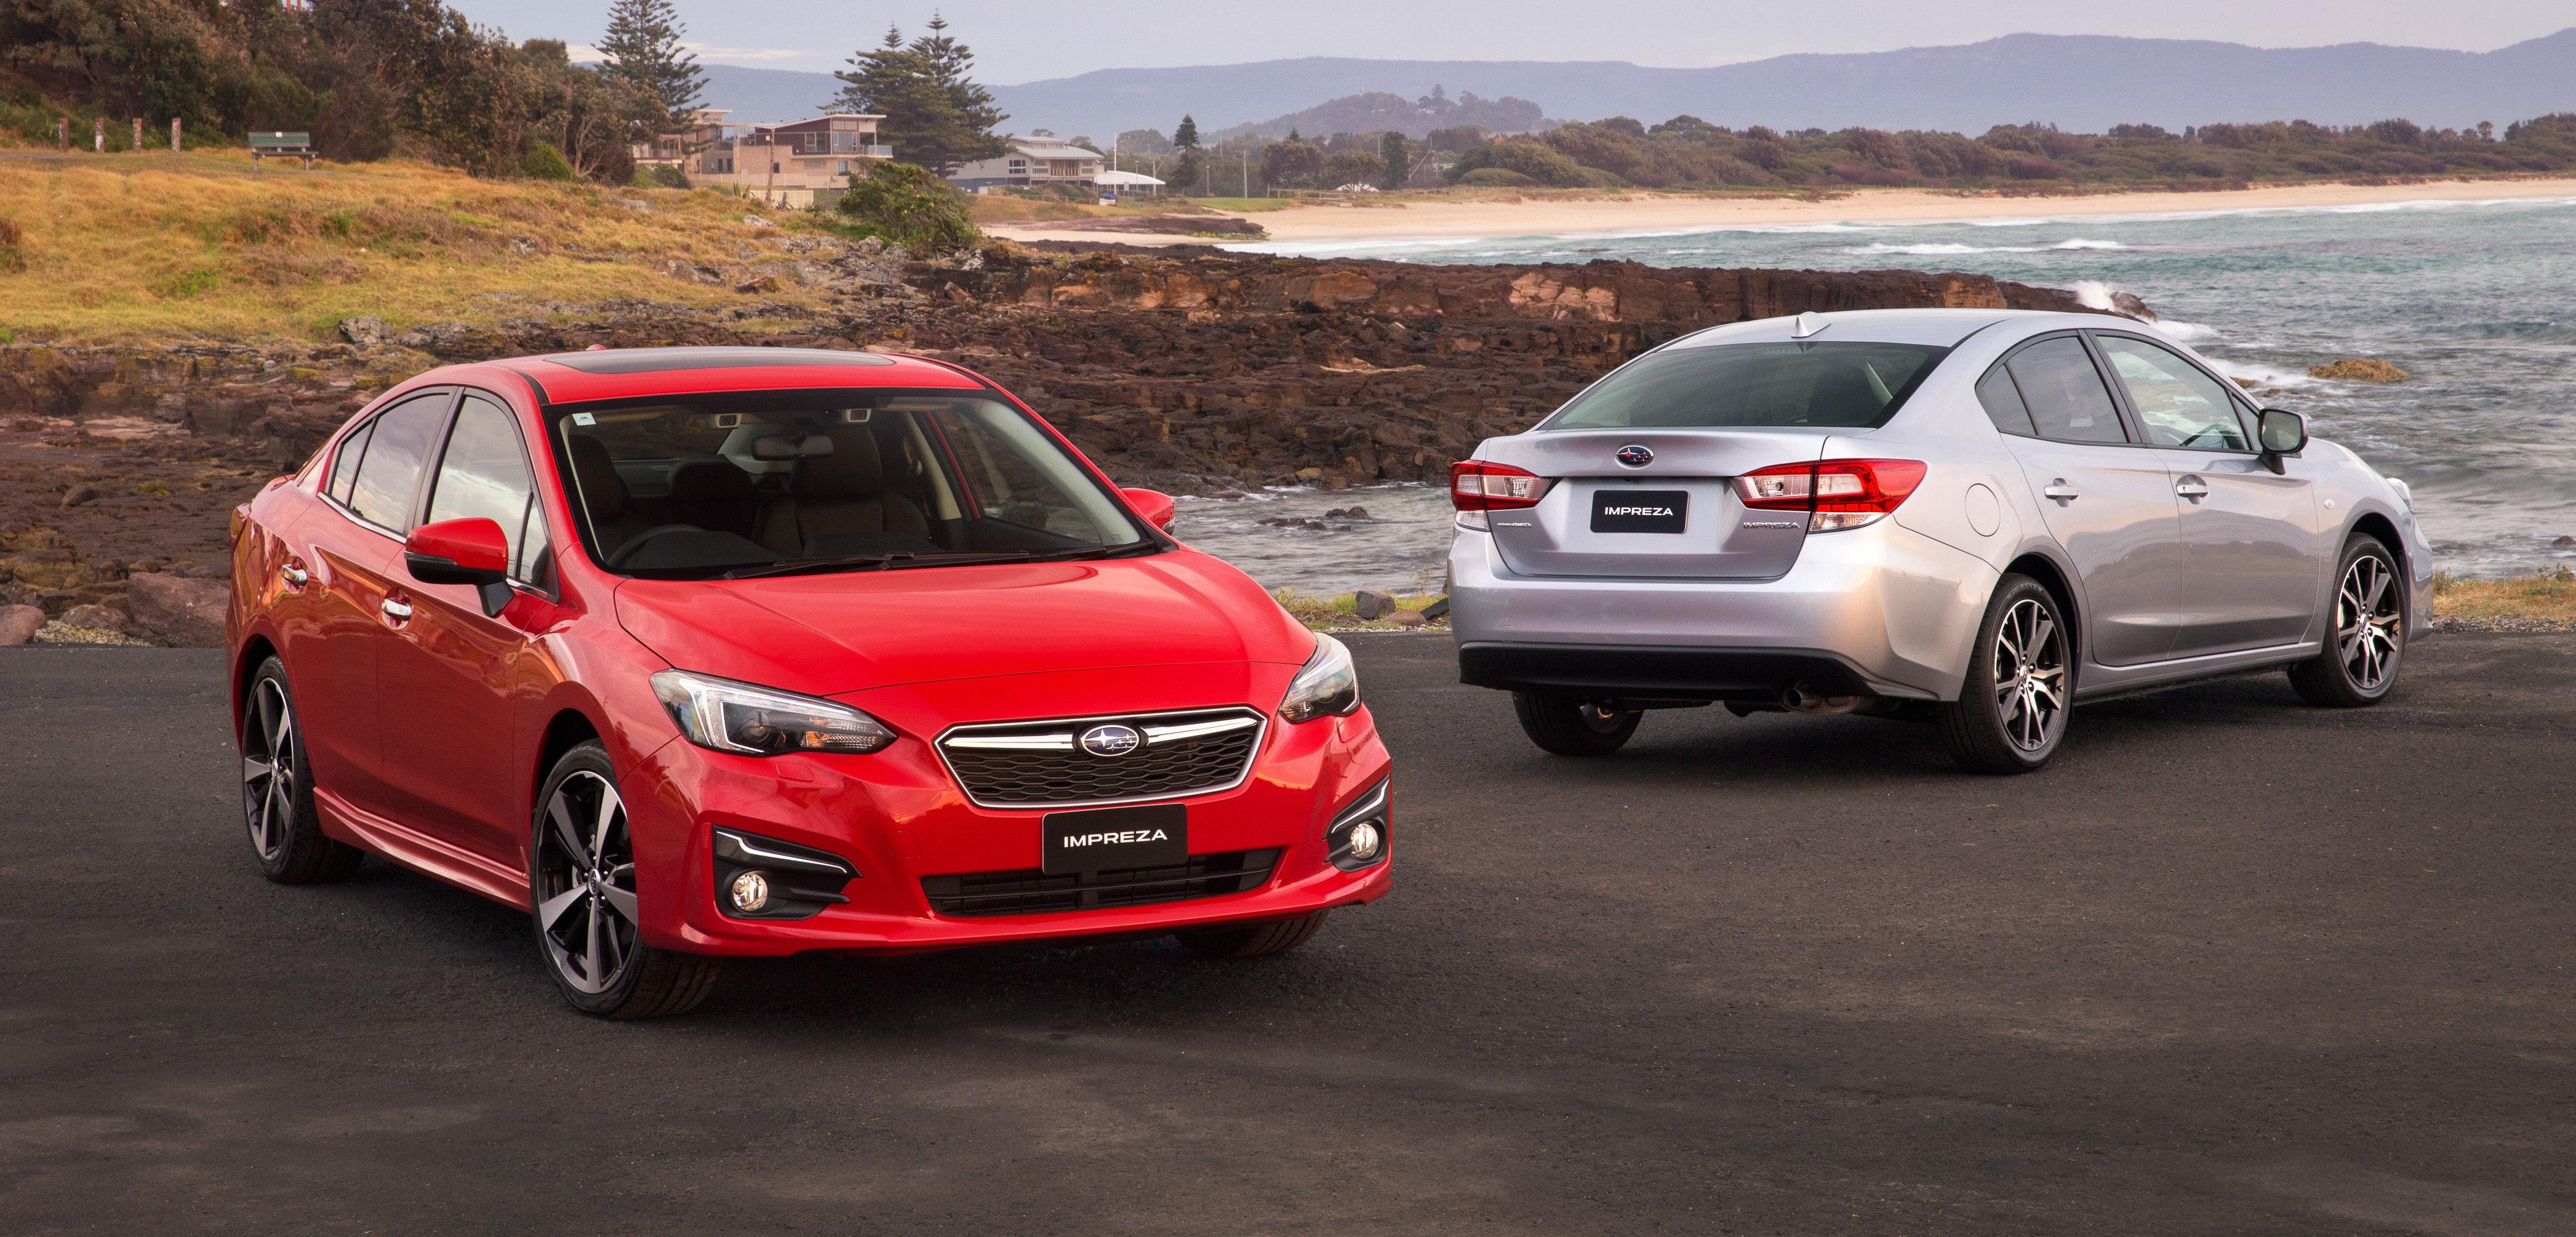 Amazing 2017 Subaru Impreza Review  CarAdvice